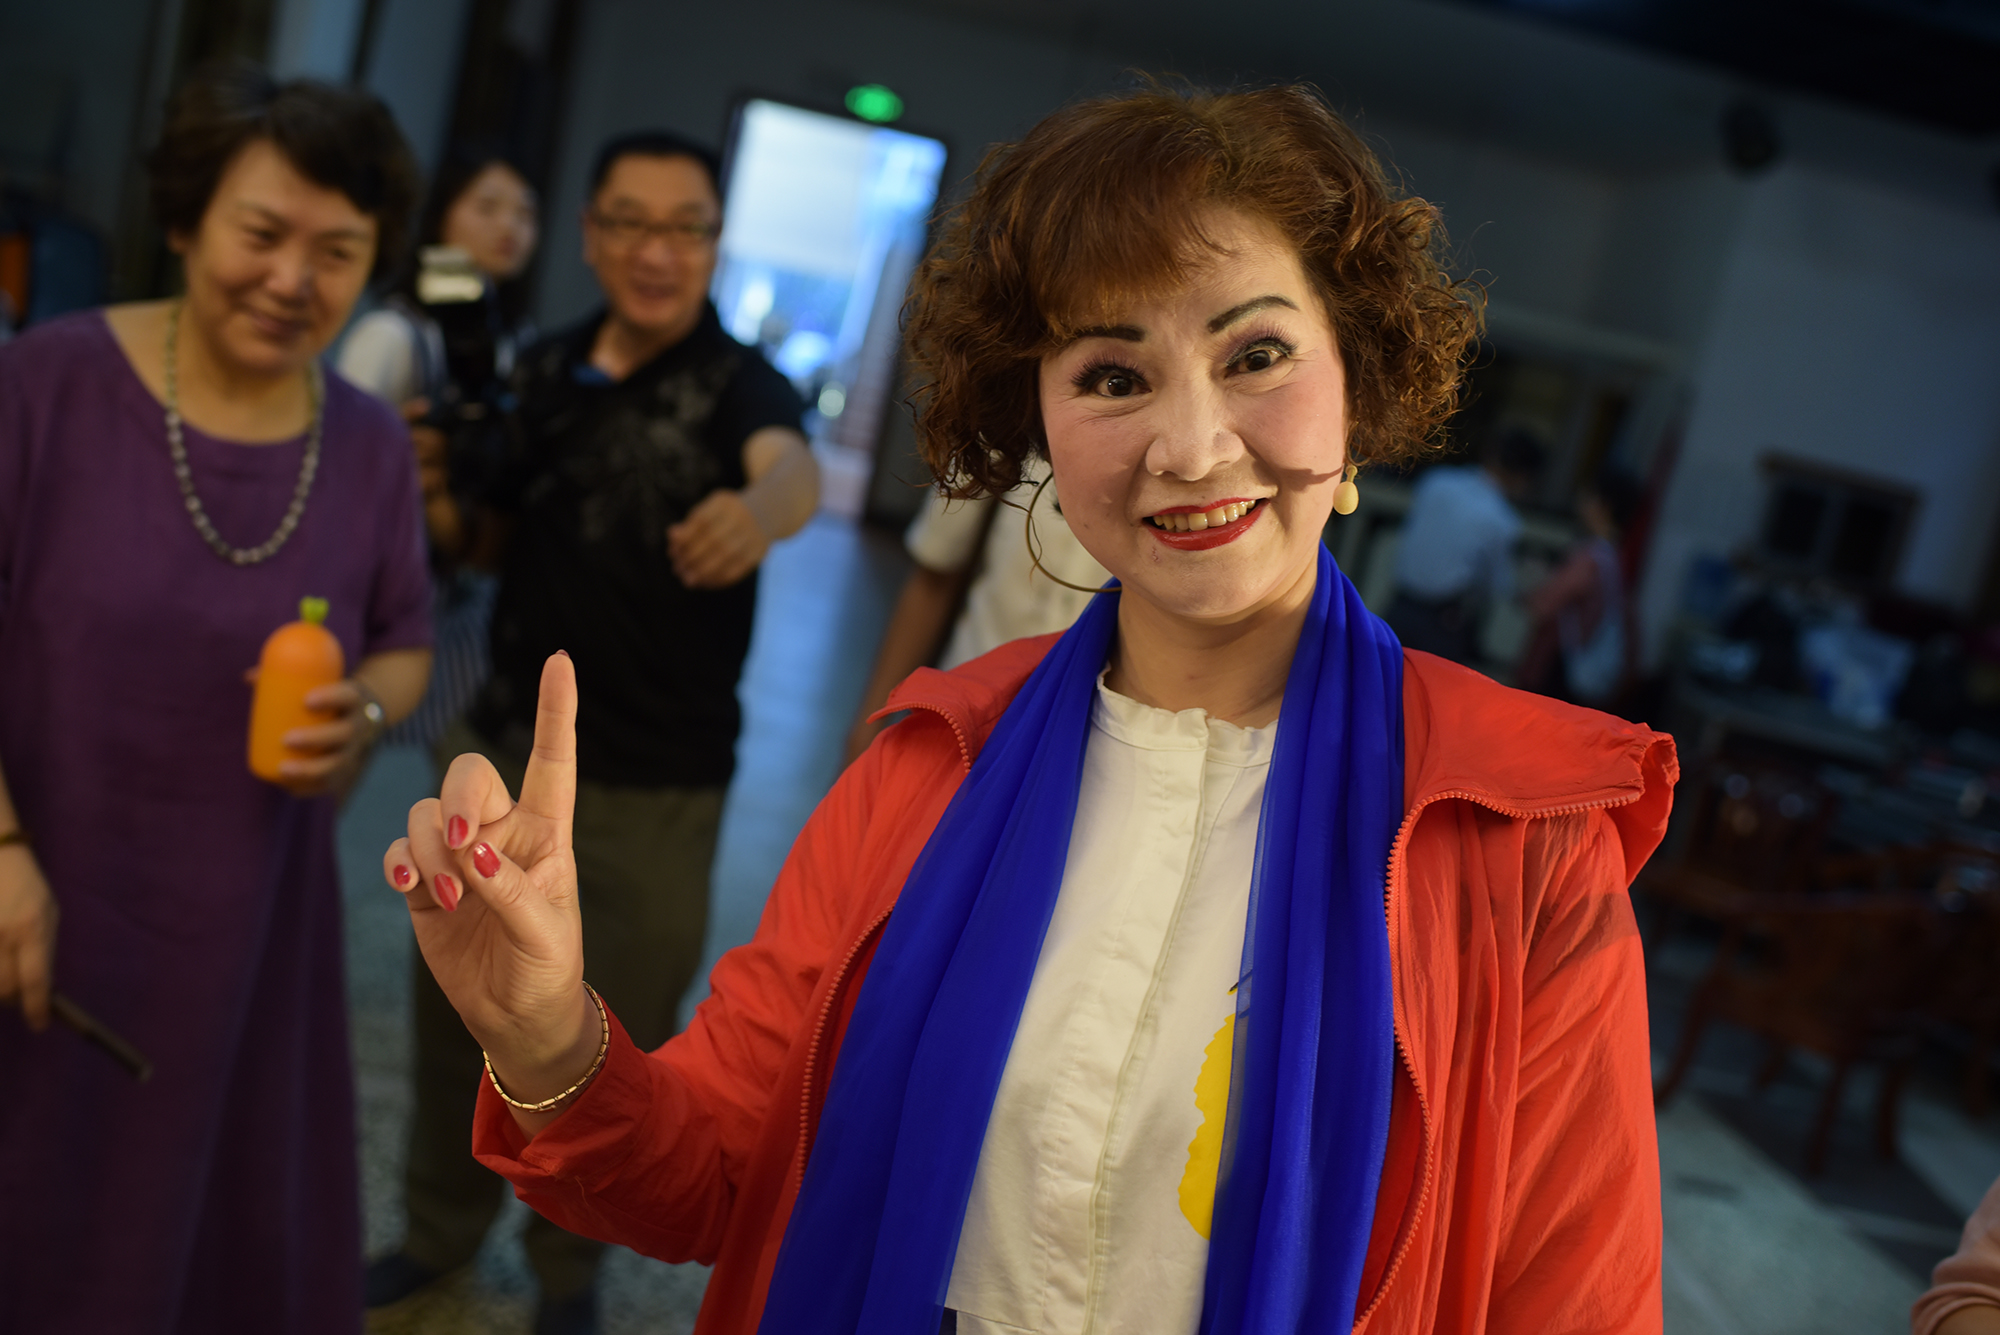 Modern Peking Opera performance, Jingzhou 2018